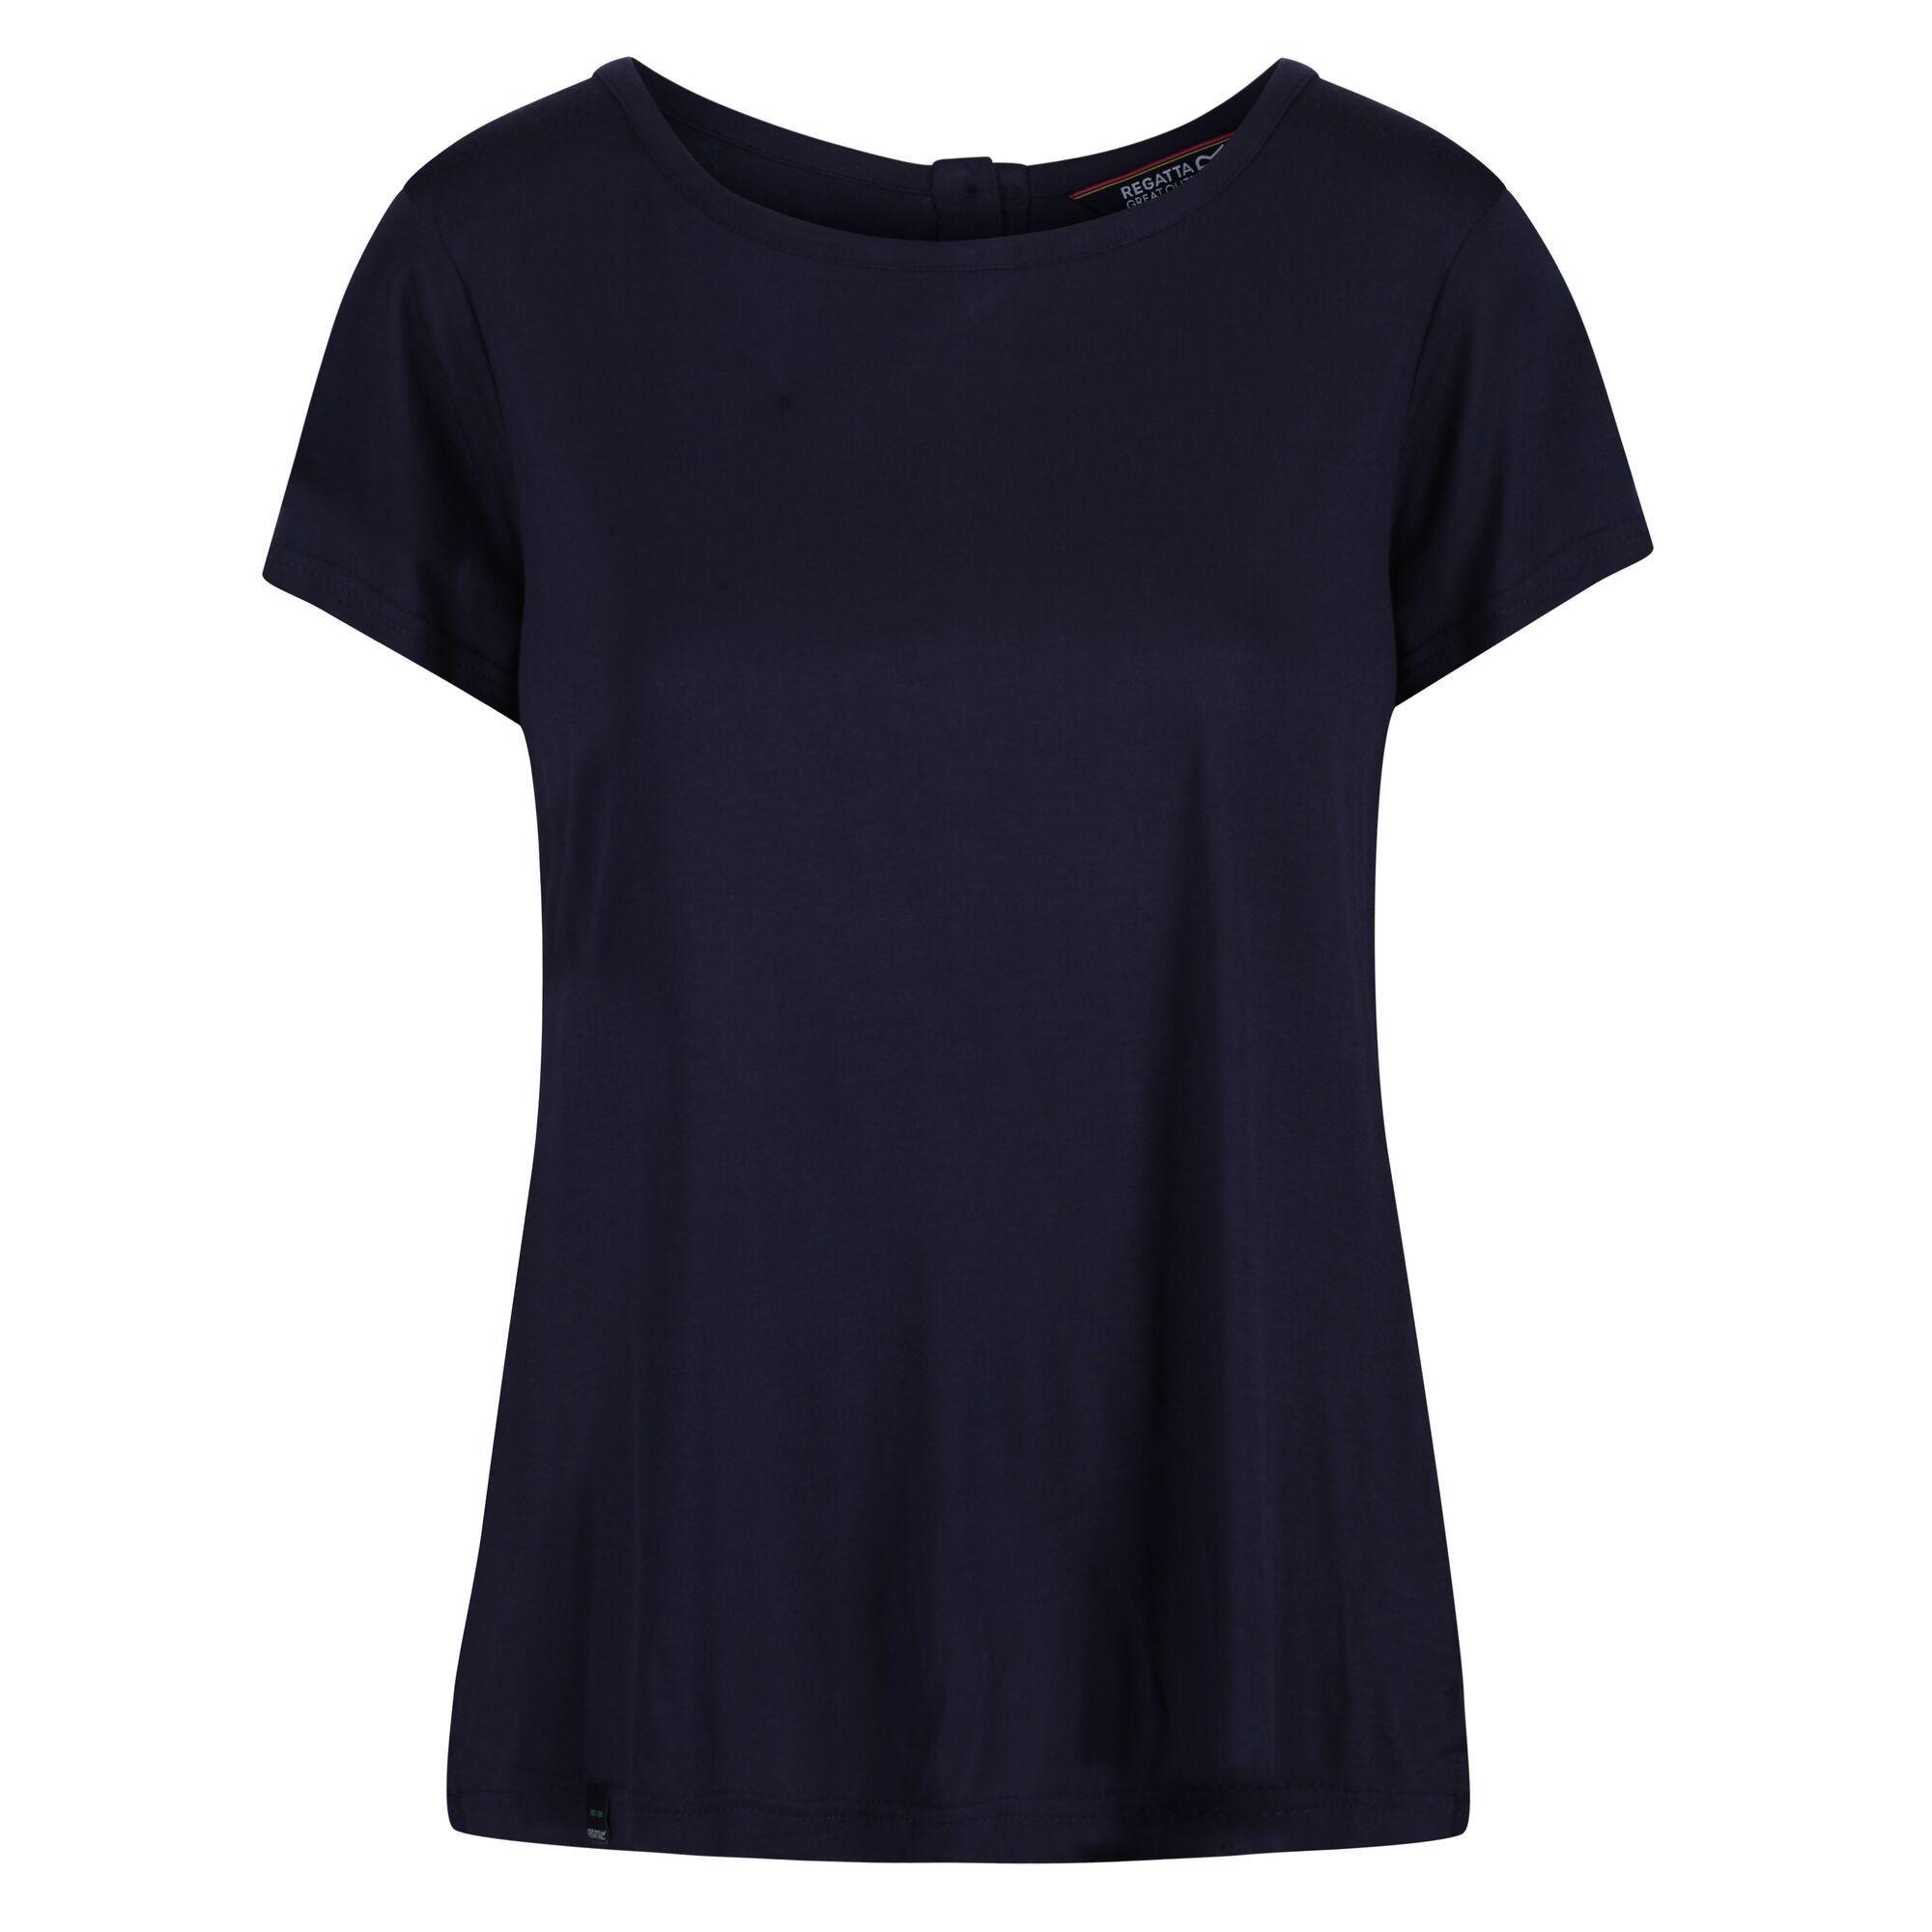 Regatta Womens/Ladies Layer Printed T-Shirt